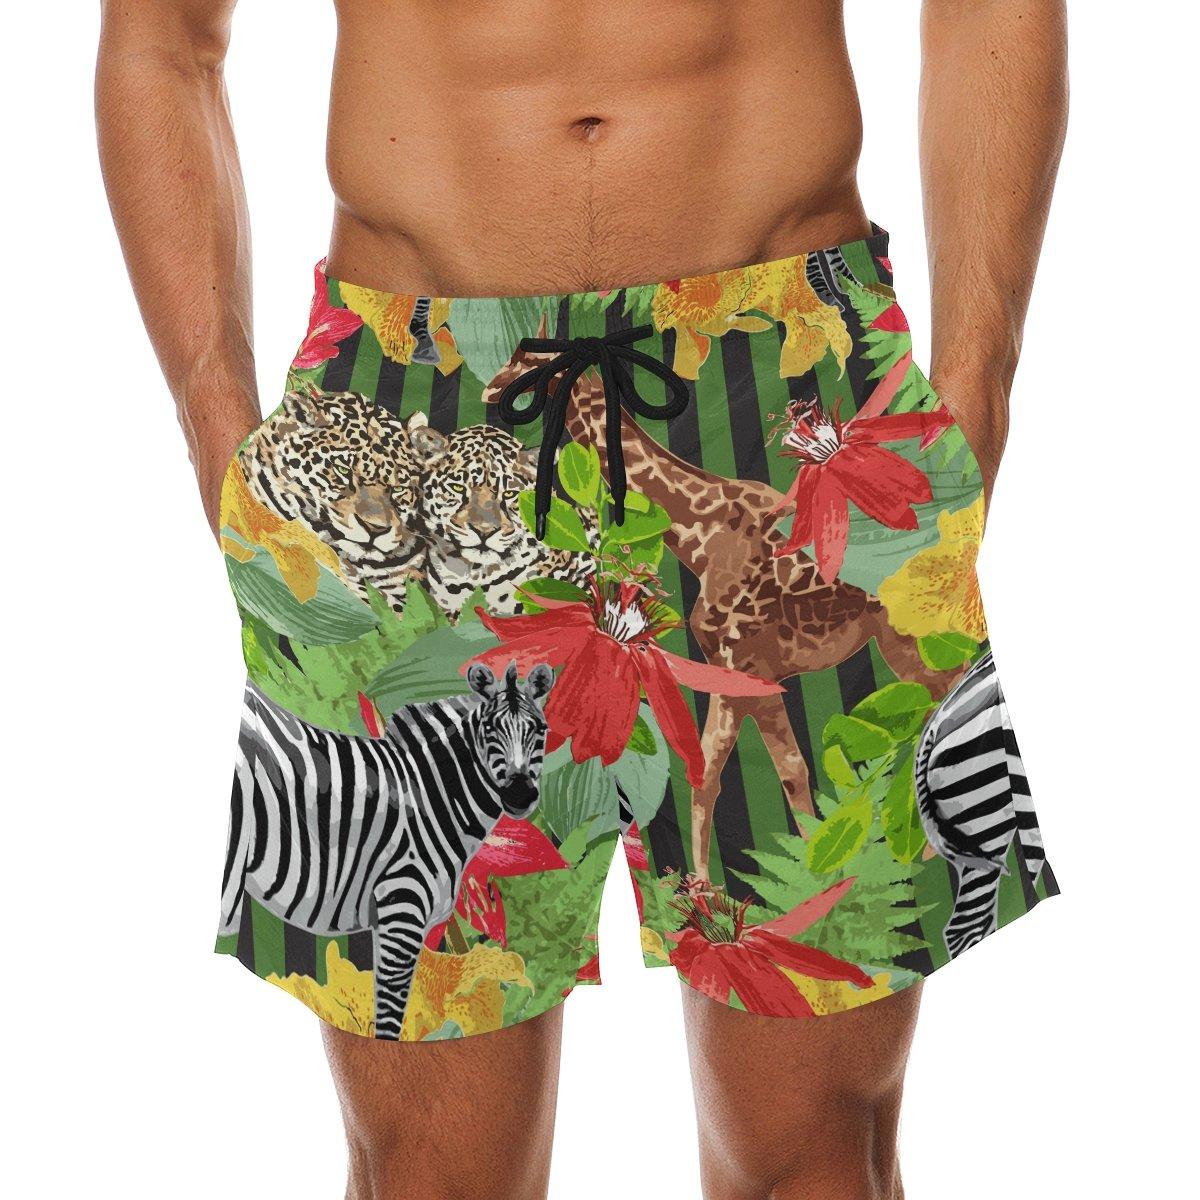 LORVIES Mens Leopards Zebra Giraffe Beach Board Shorts Quick Dry Swim Trunk